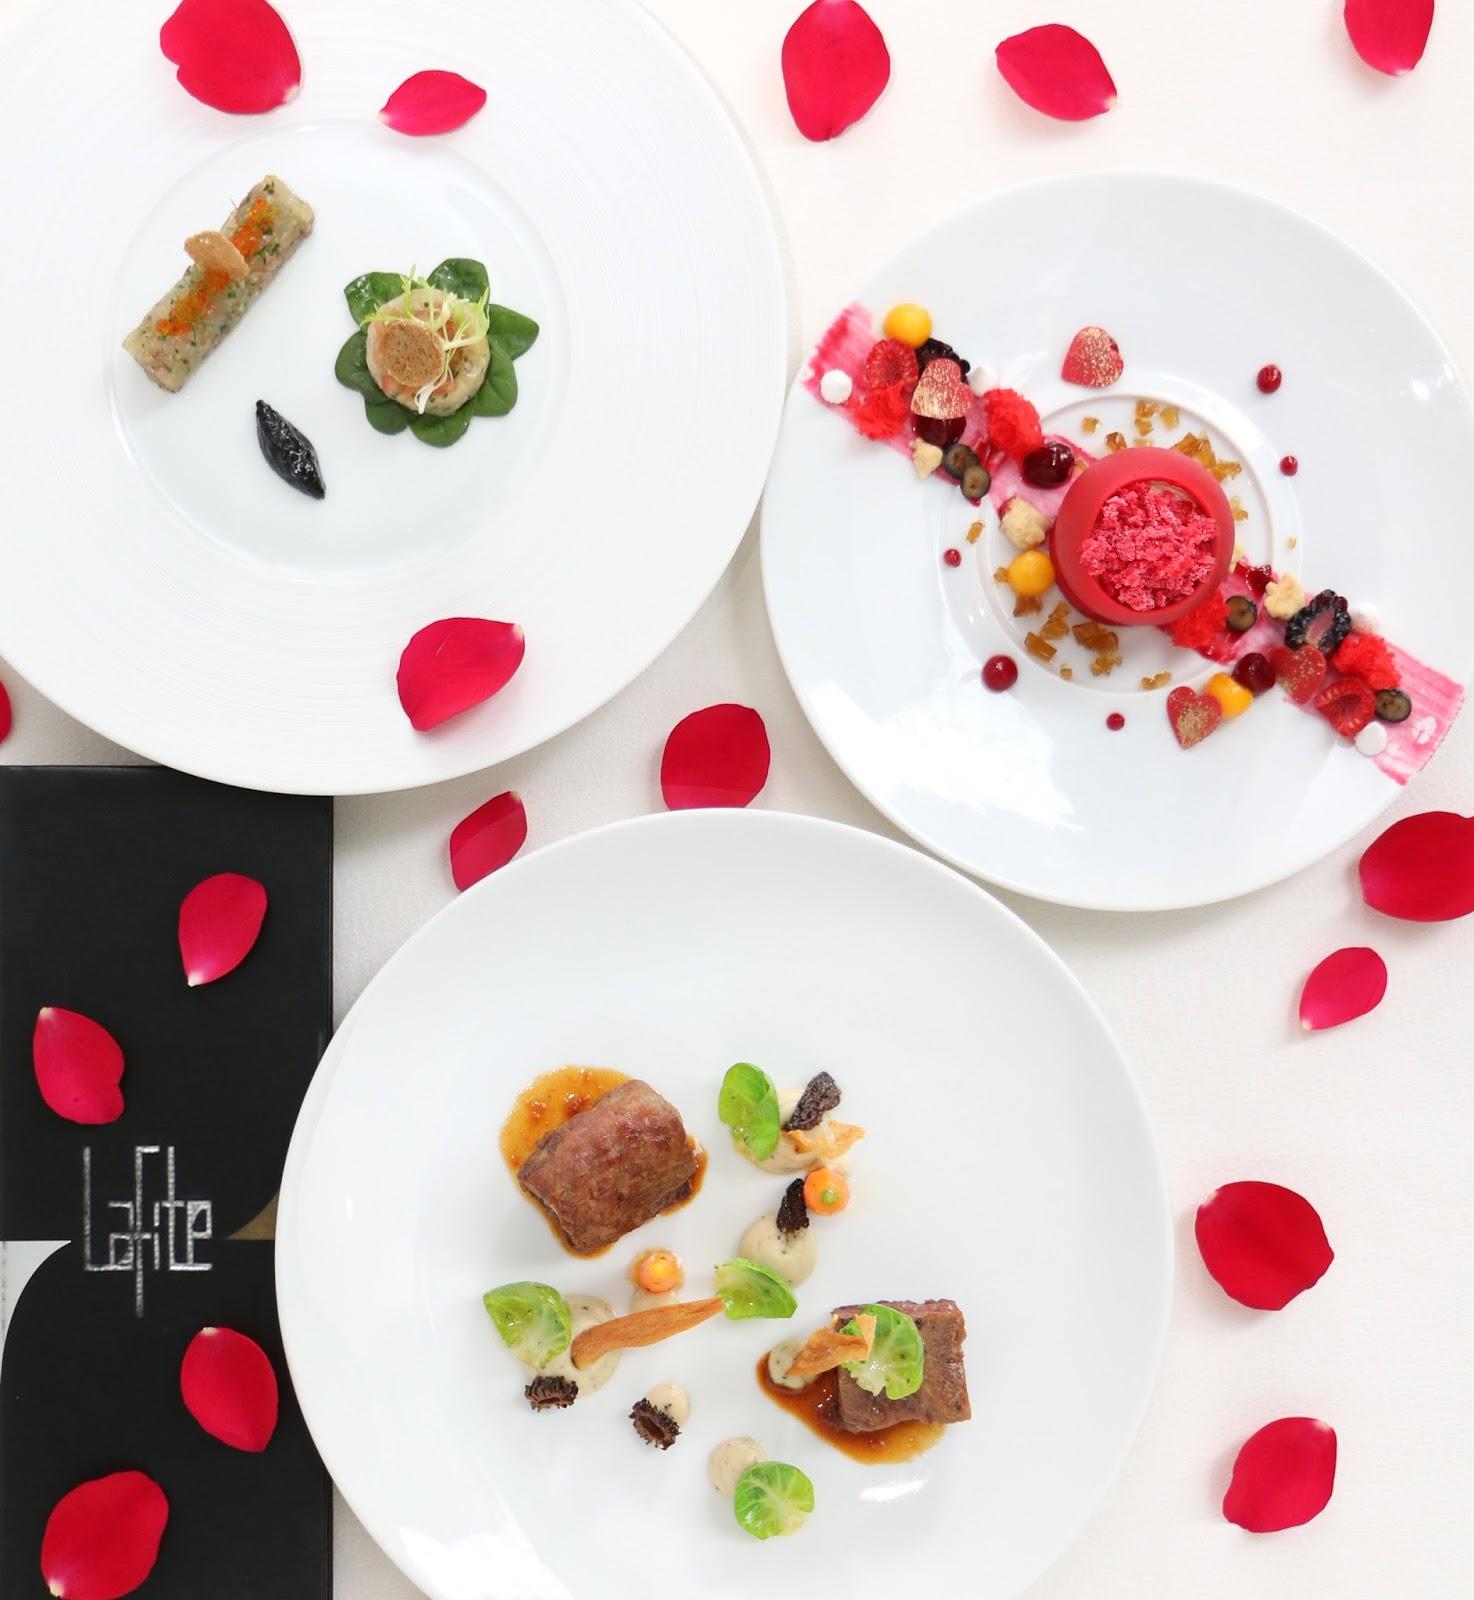 Everyday Food I Love Valentine S Day Dinner At Shangri La Hotel